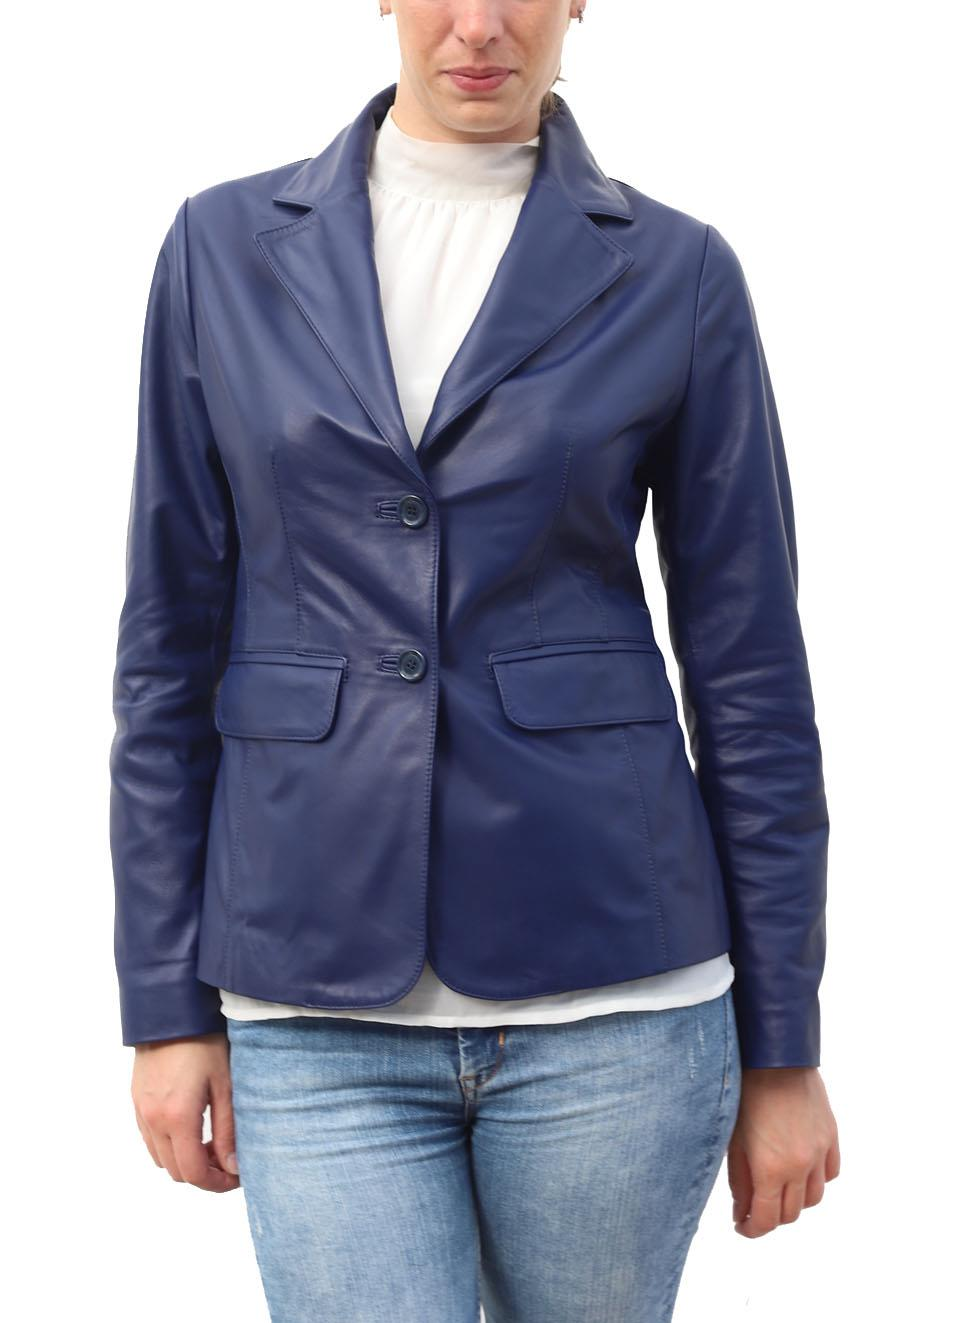 the latest 6ab49 c8724 Giacca sartoriale da donna in pelle blu